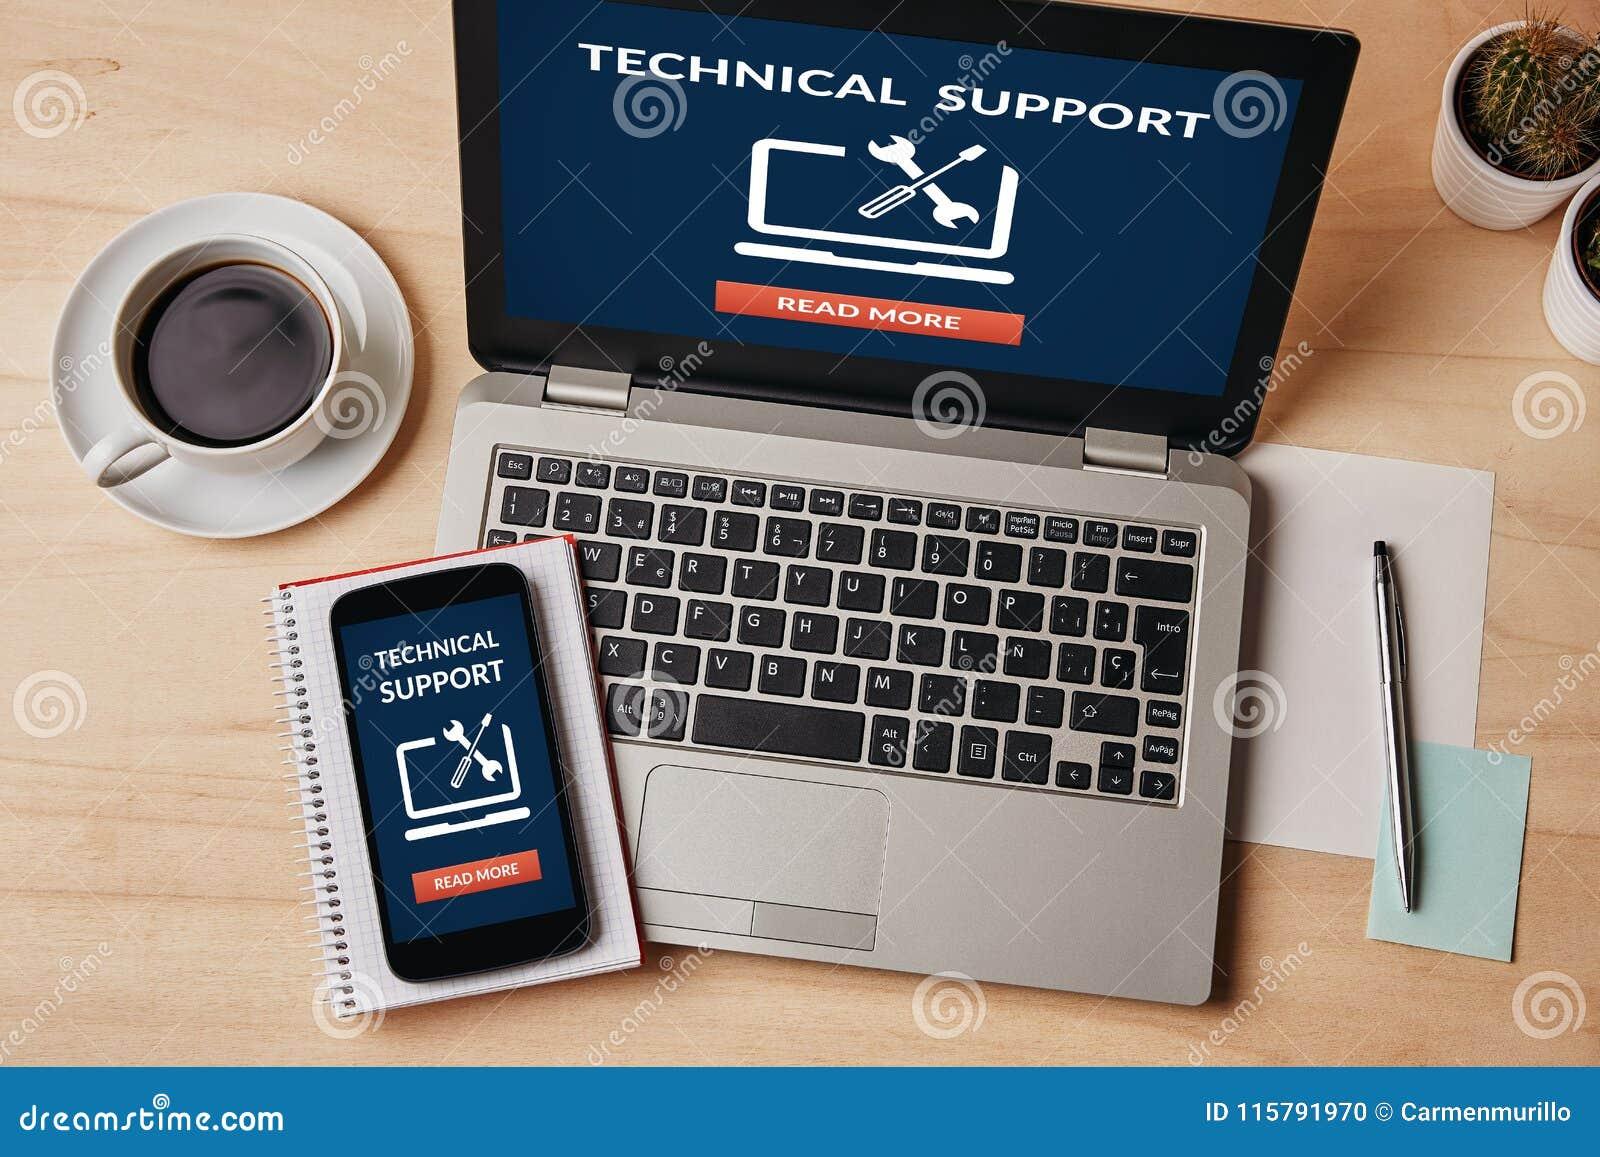 Todo sobre soporte tecnico